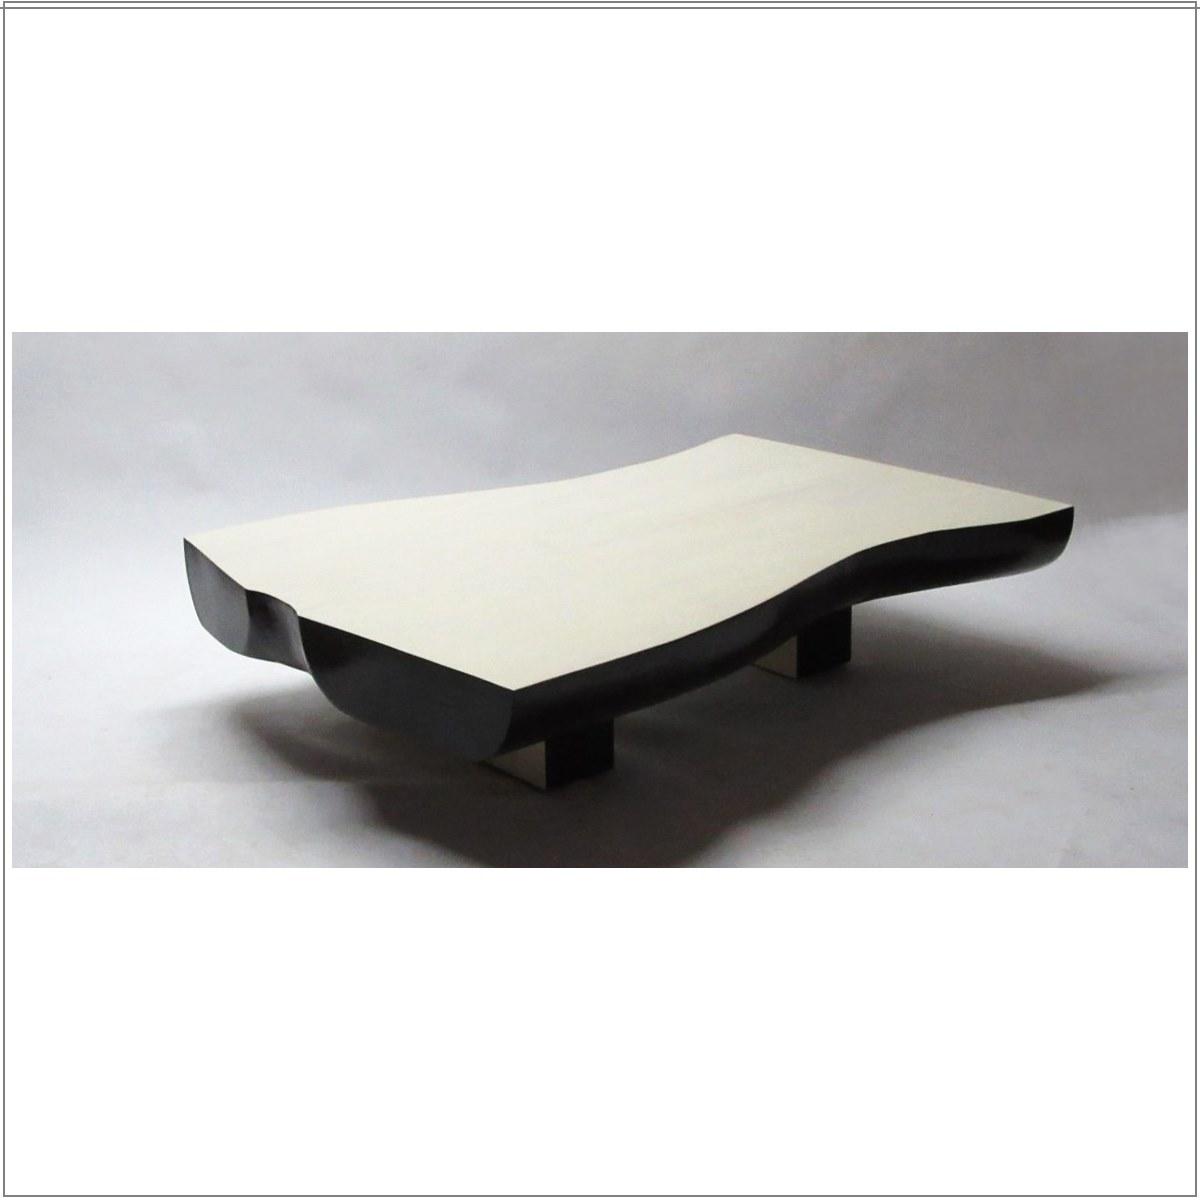 sculptured laminated slab cocktail table